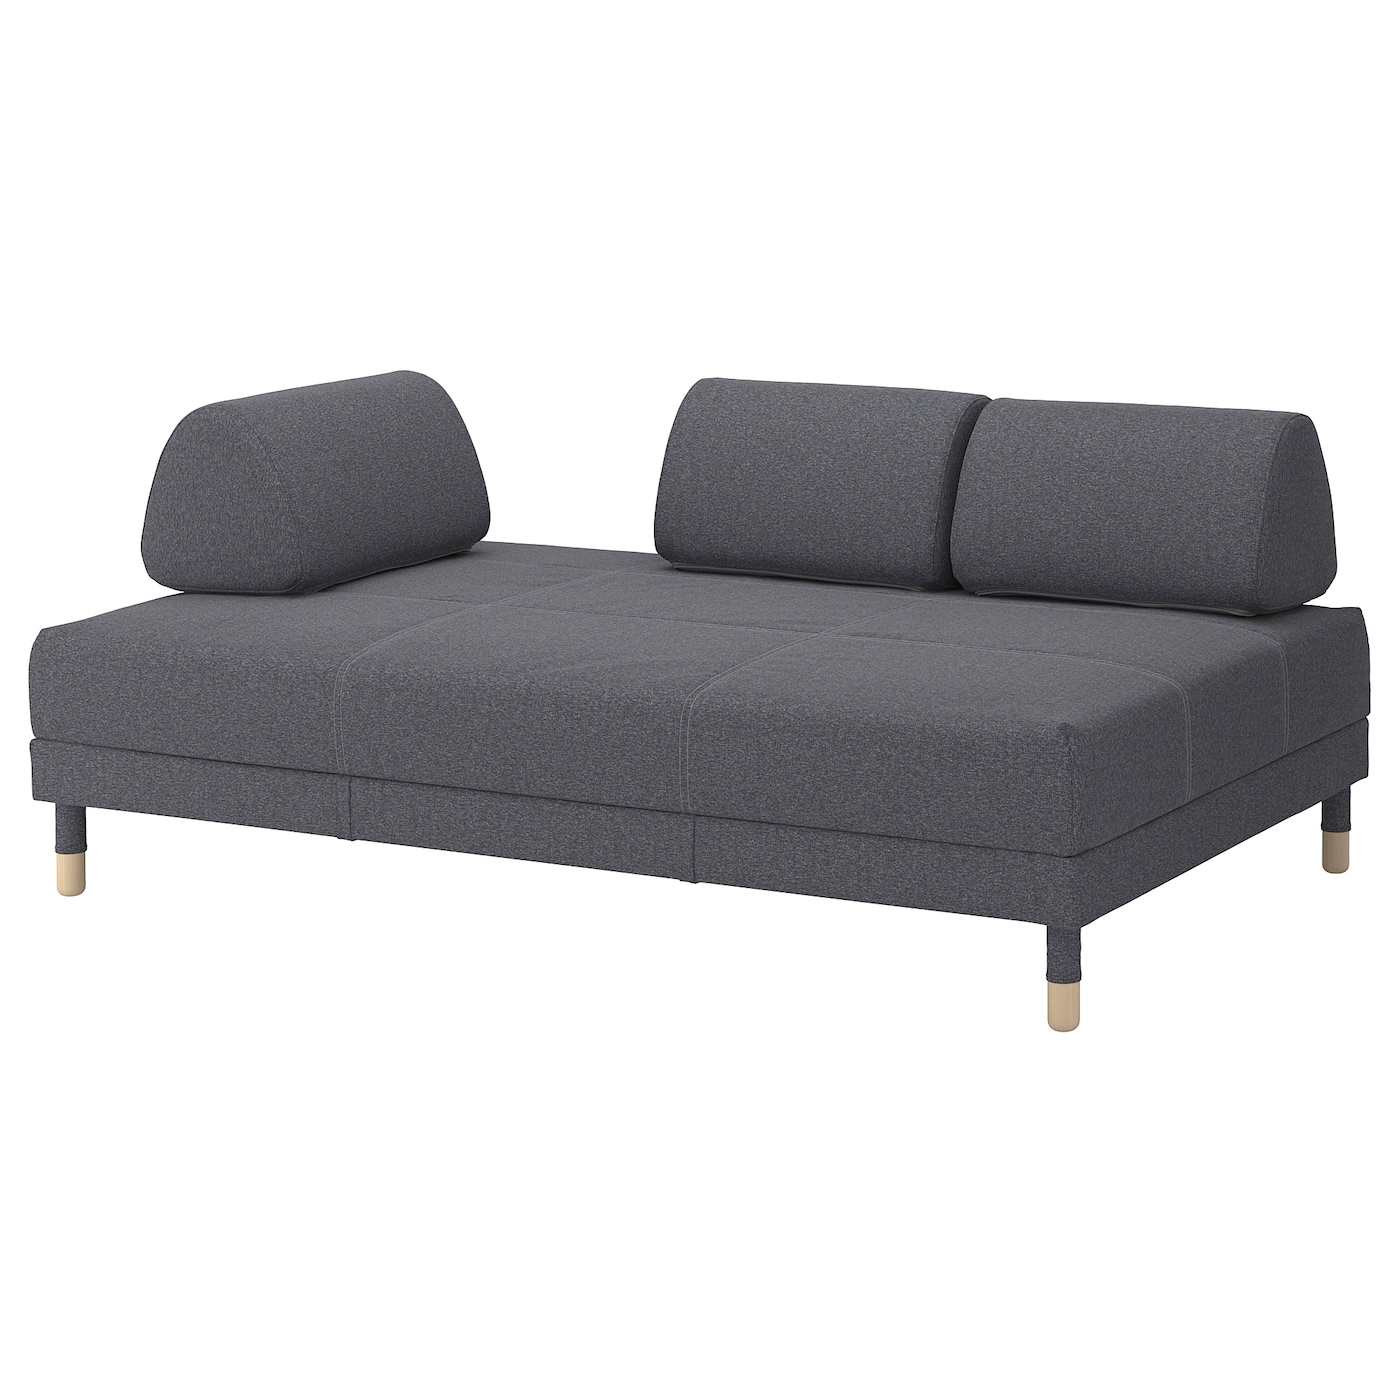 - FLOTTEBO Sleeper Sofa - Gunnared Medium Gray - IKEA